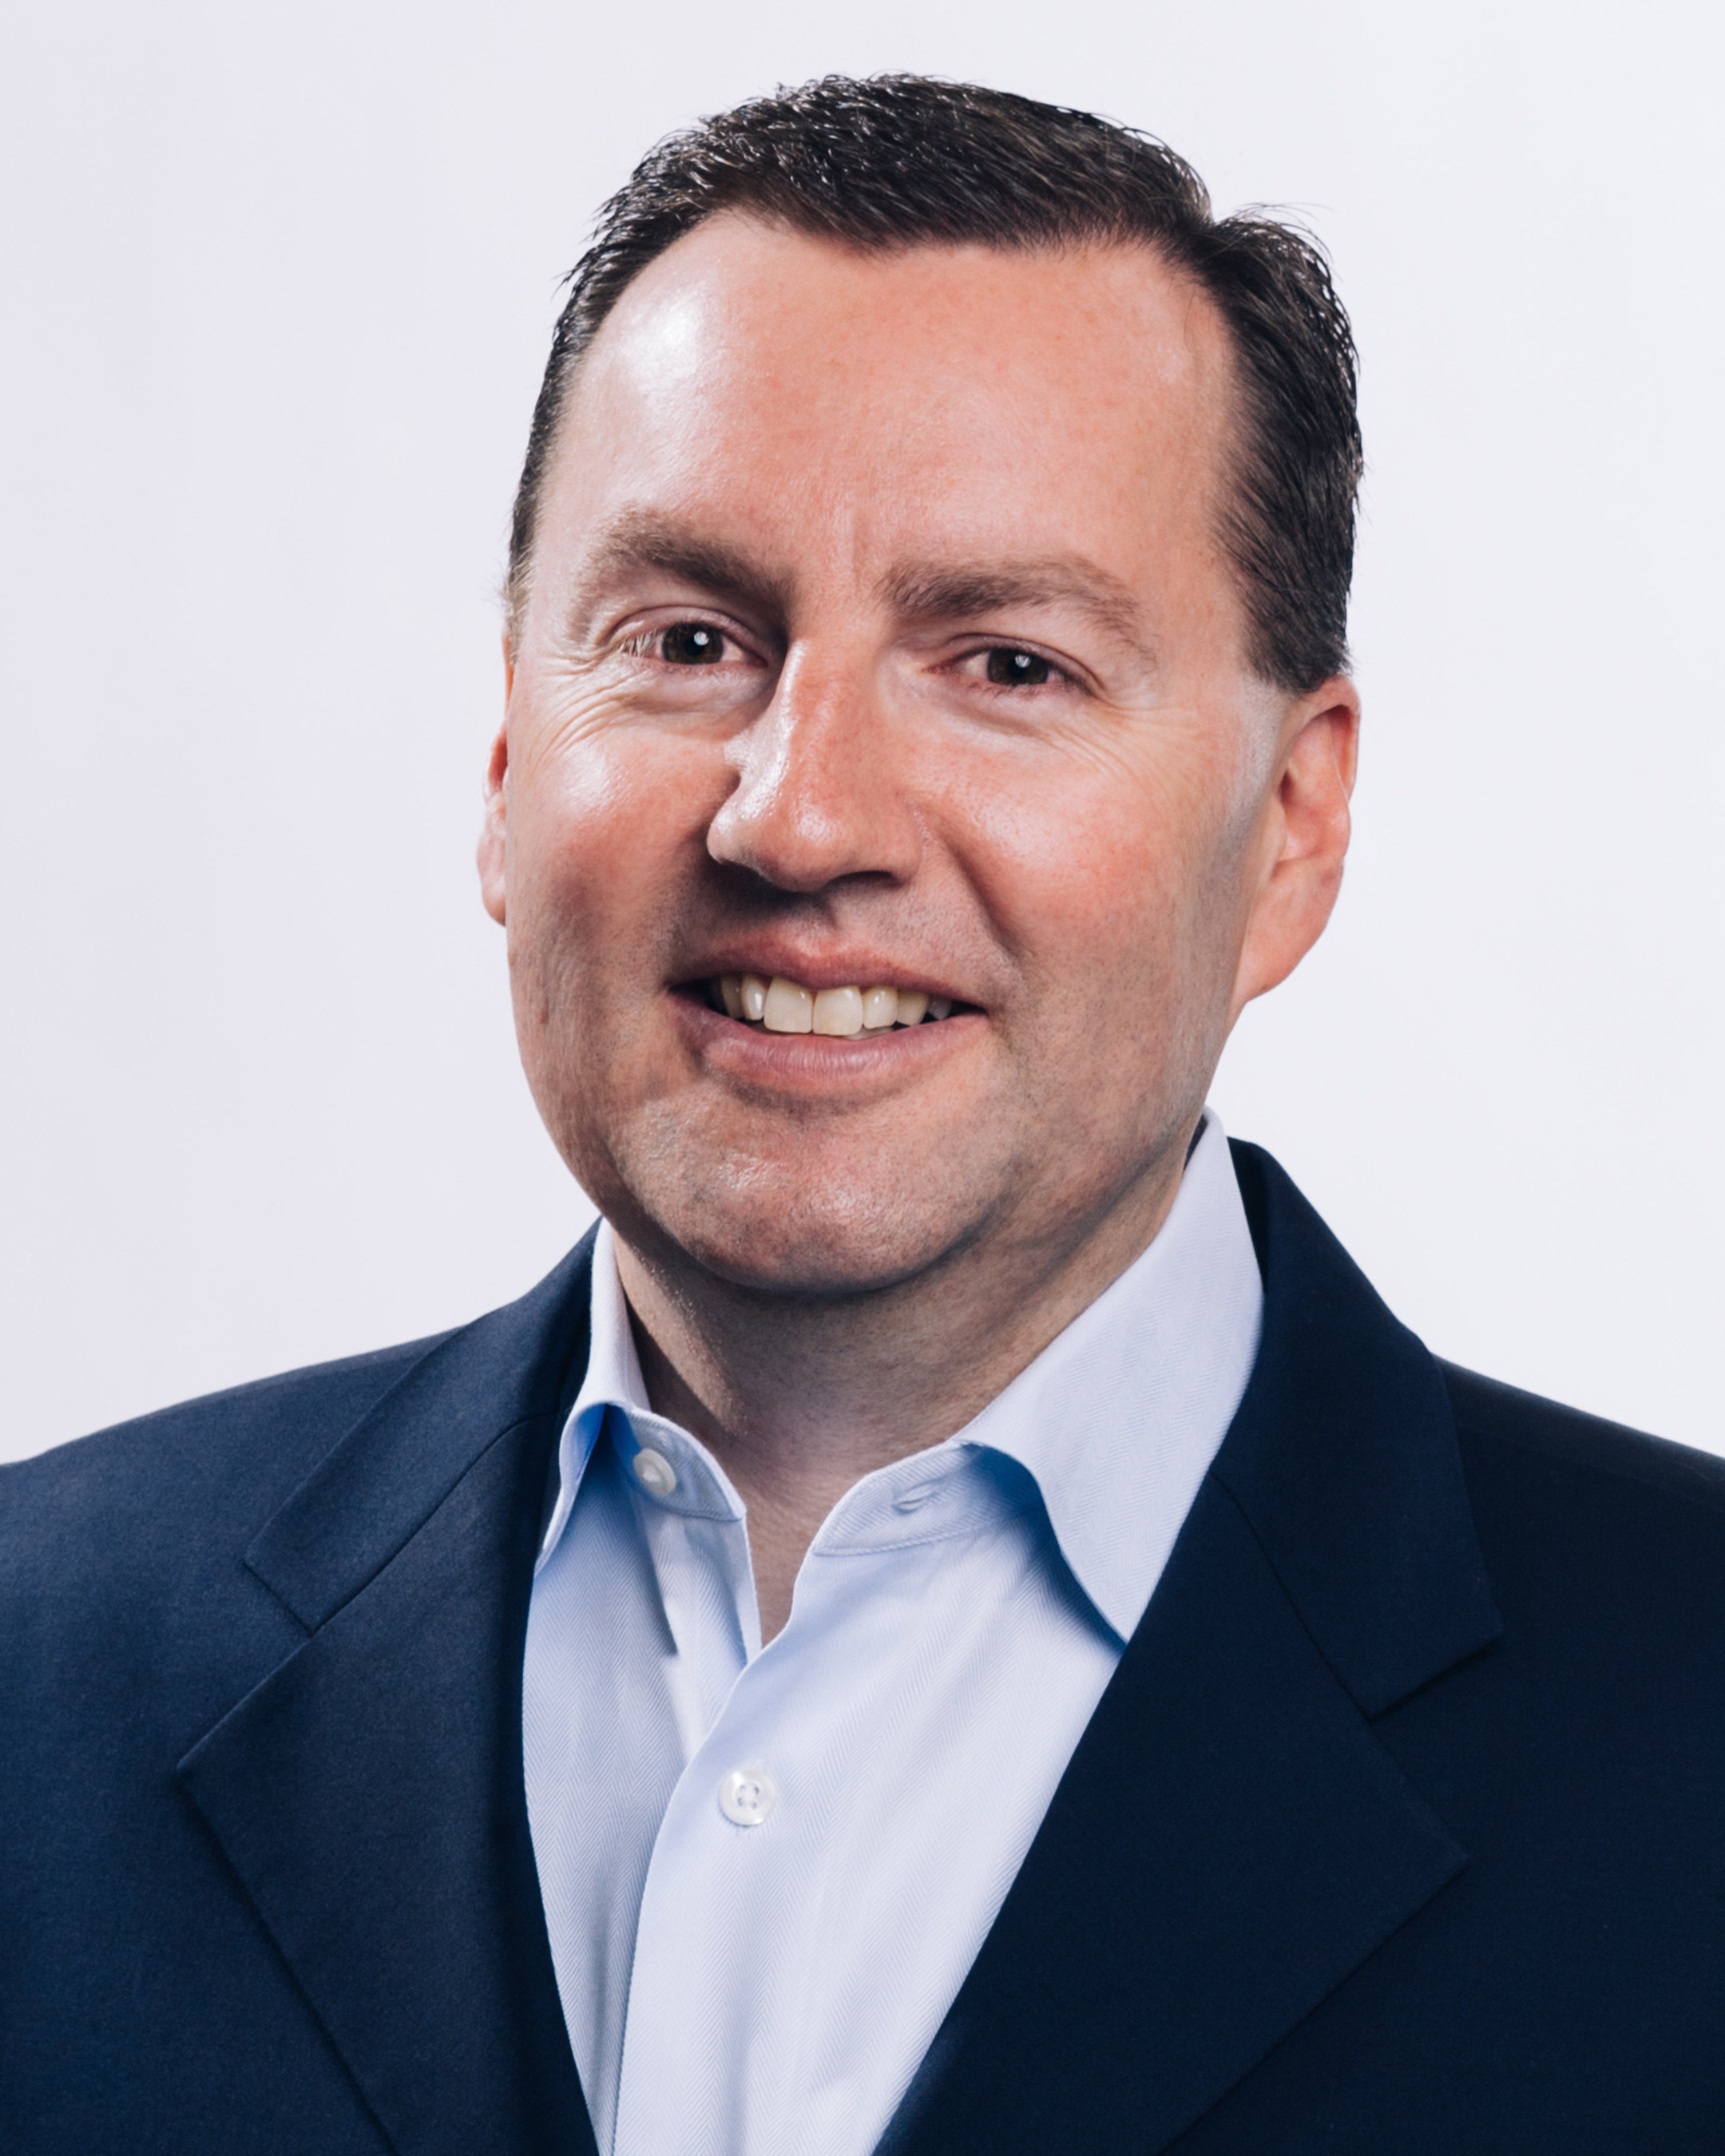 Restaurants Unlimited, Inc. Names Jim Eschweiler as New President and CEO